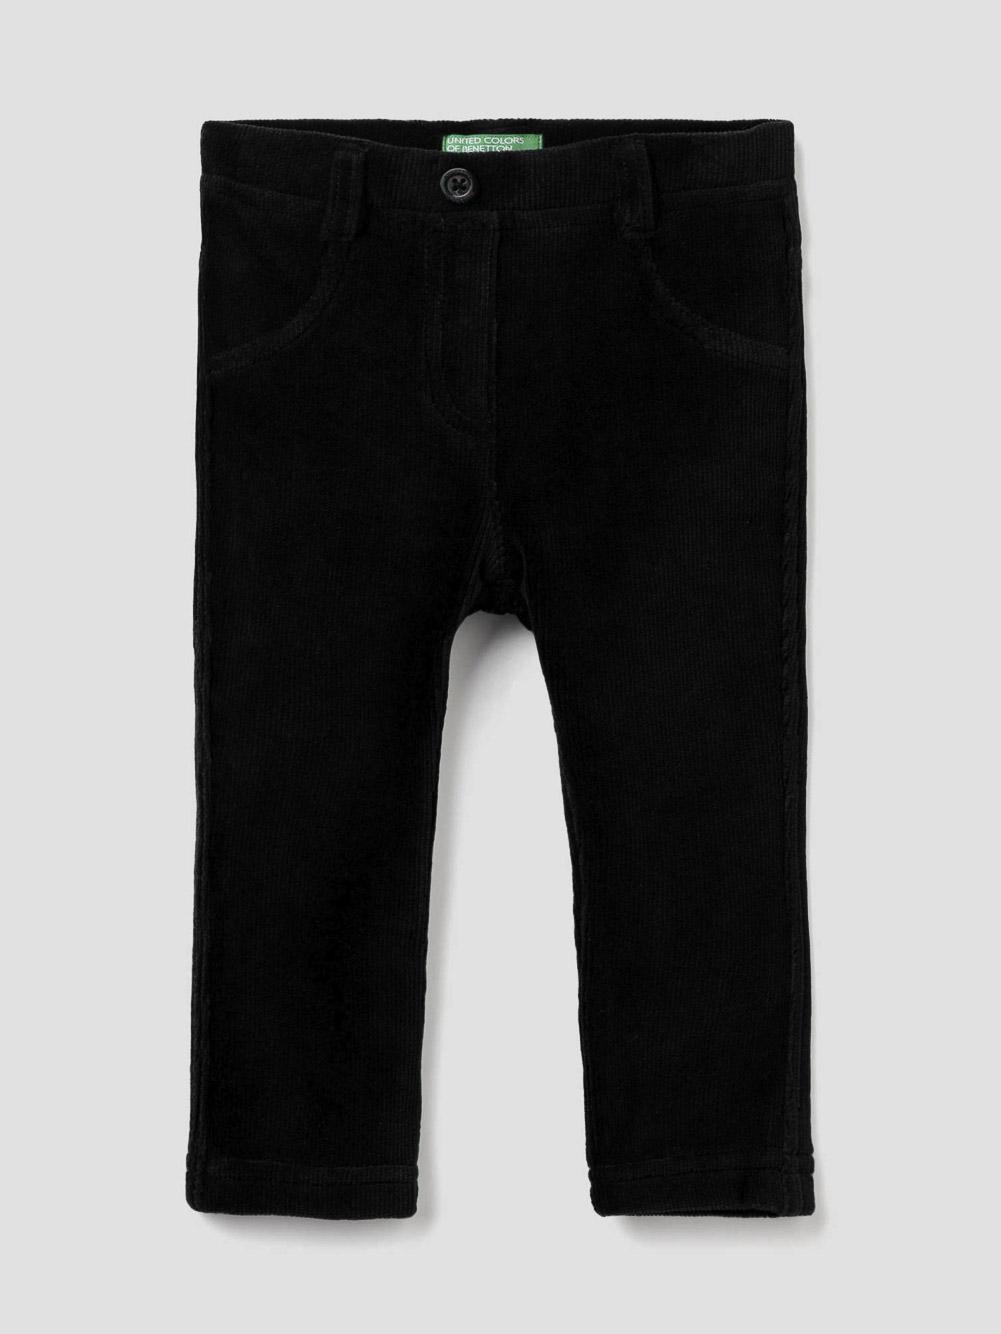 012 BENETTON Παντελόνι με ριπ ύφανση stretch 4DZB57MI0 20A100